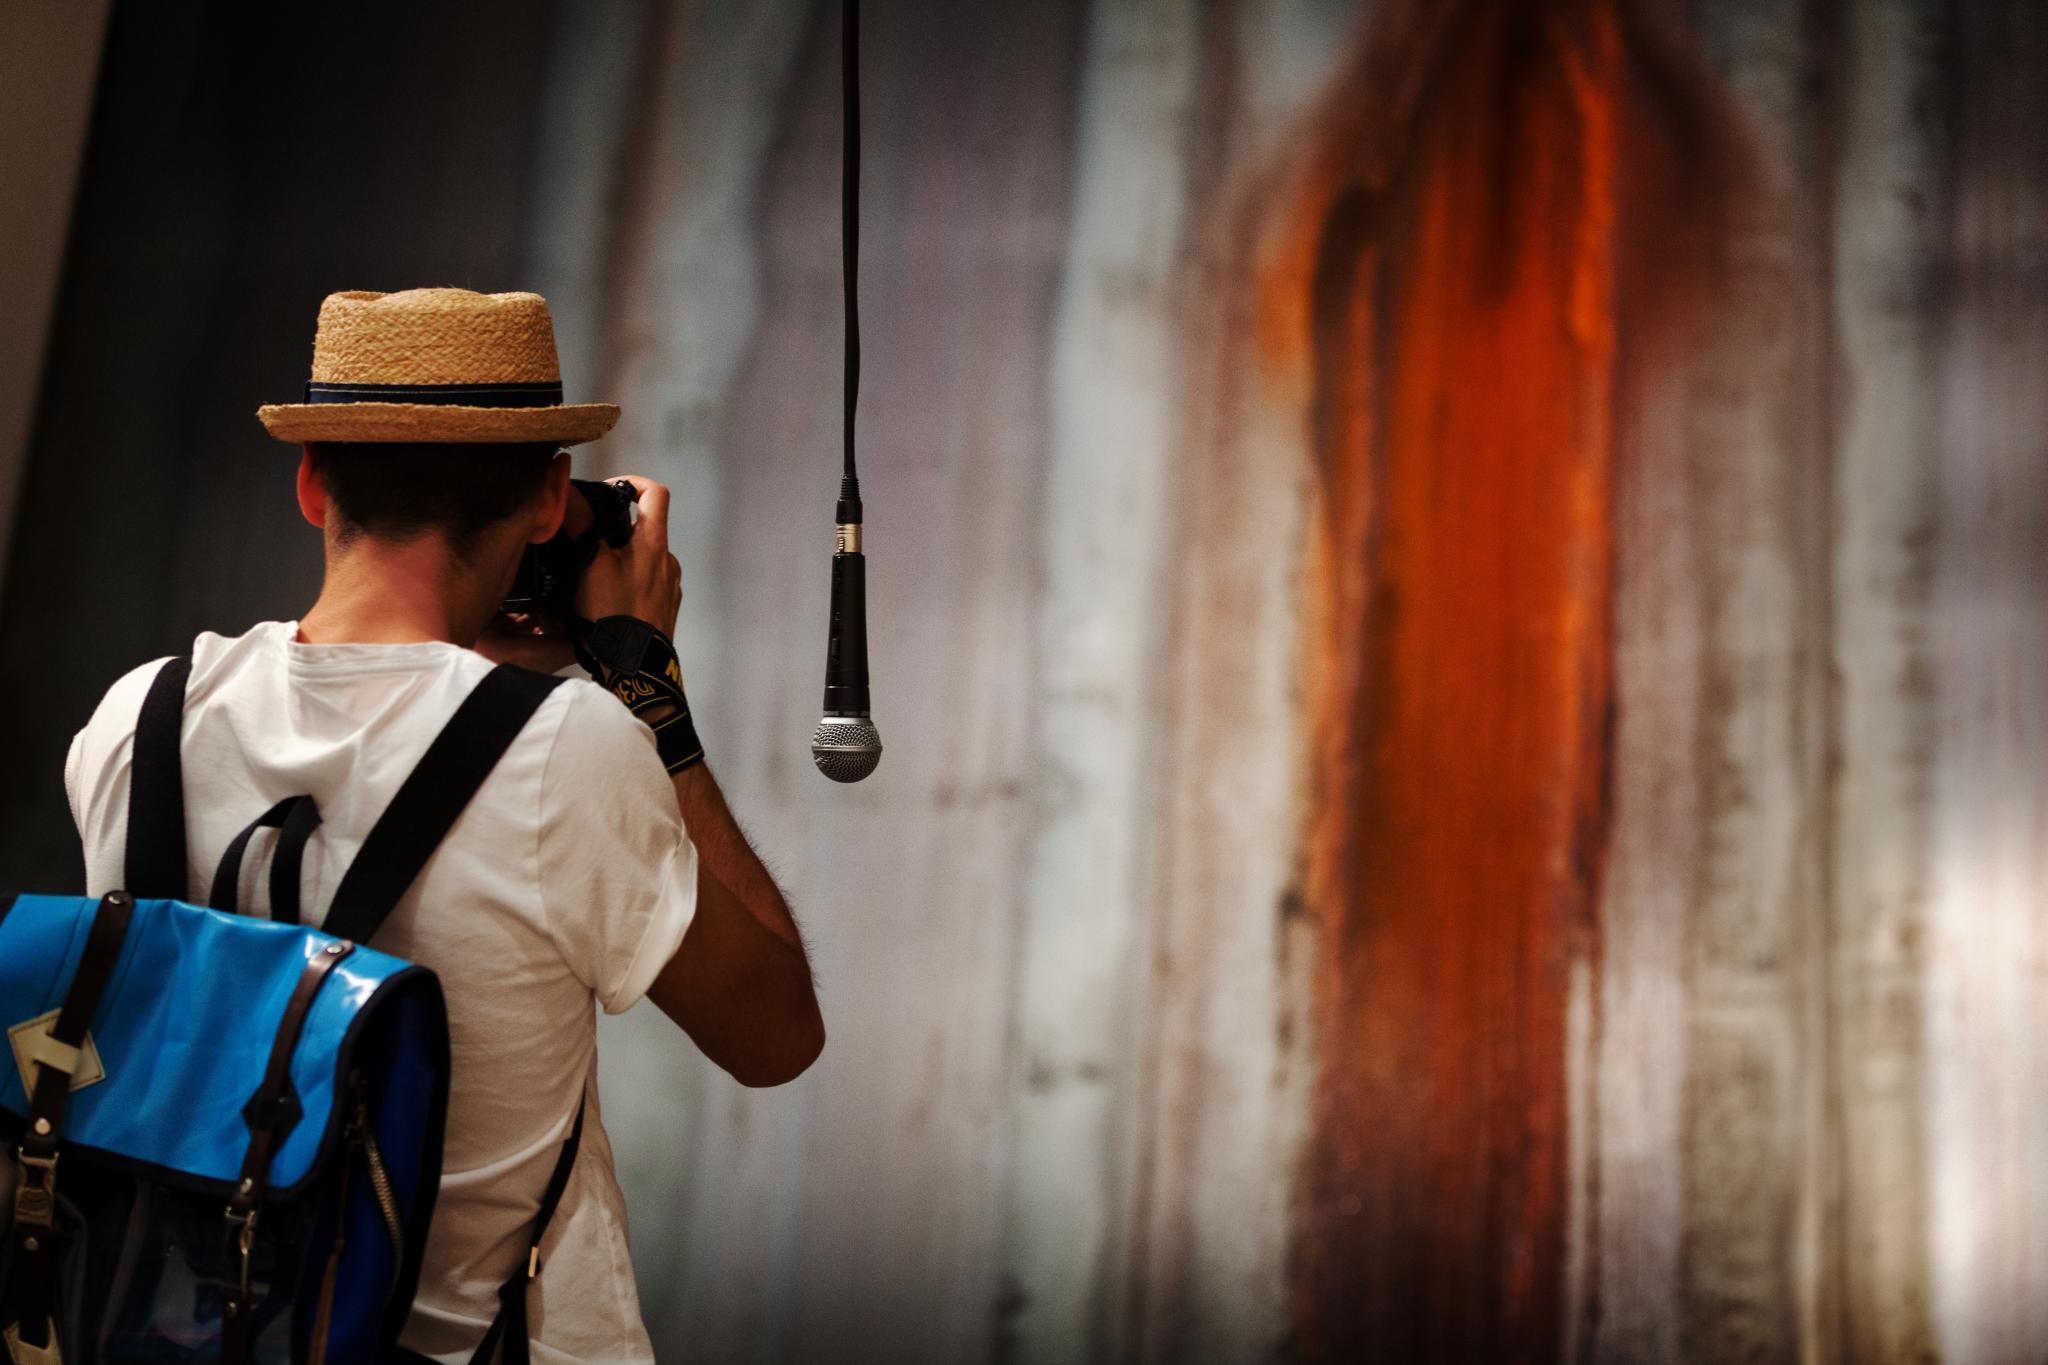 The Photographer's View by Stròlic Furlàn - Davide Gabino